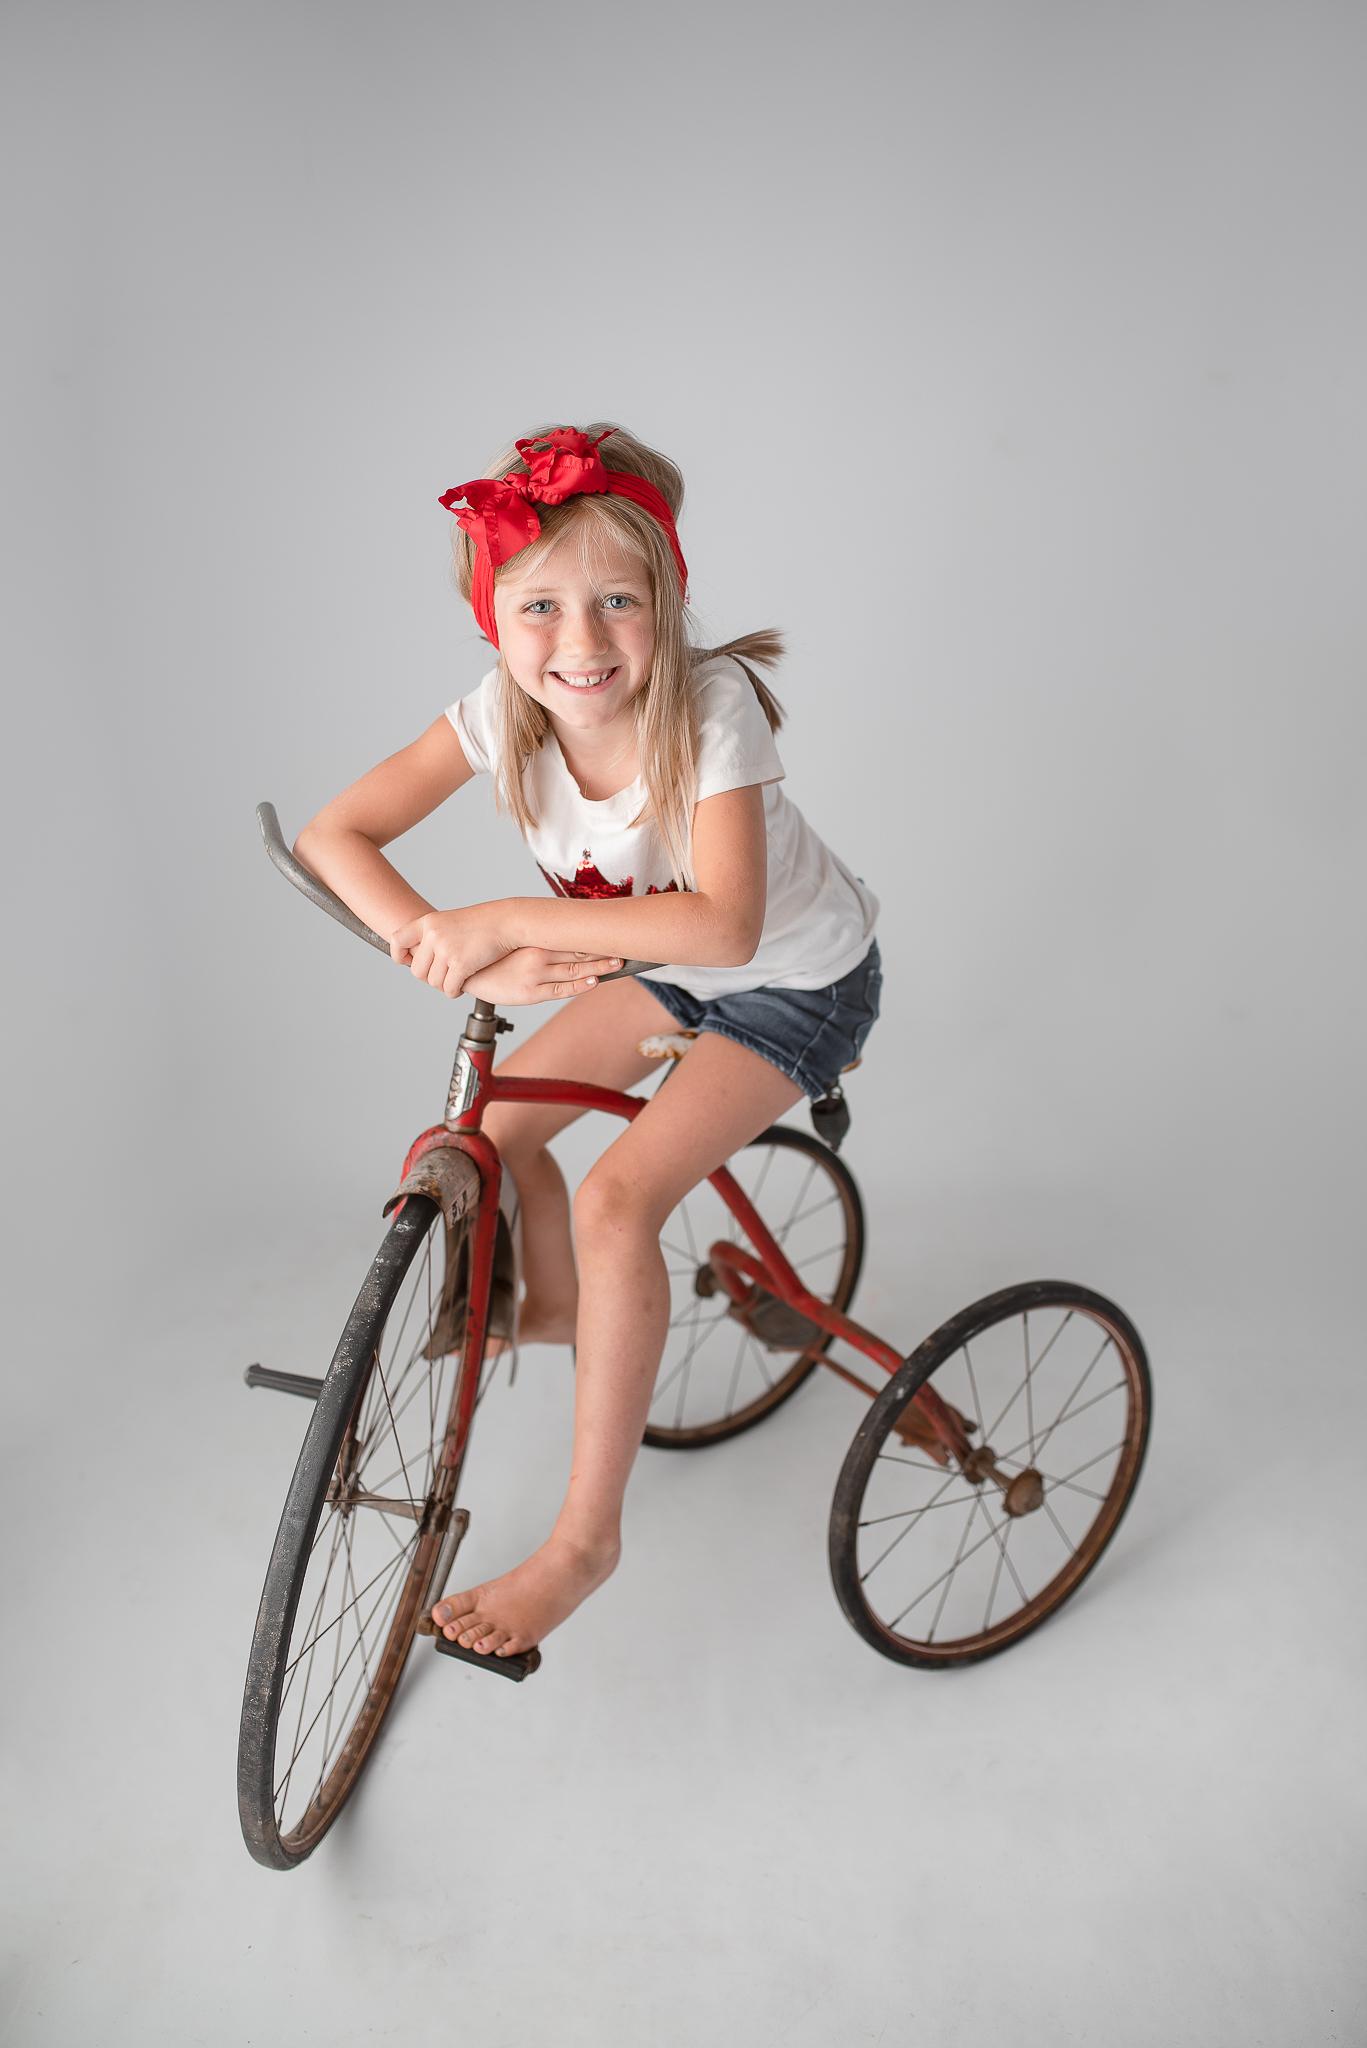 Naomi Lucienne Peterborough Photography Portrait Photography Children Photography Family Photography-11.jpg